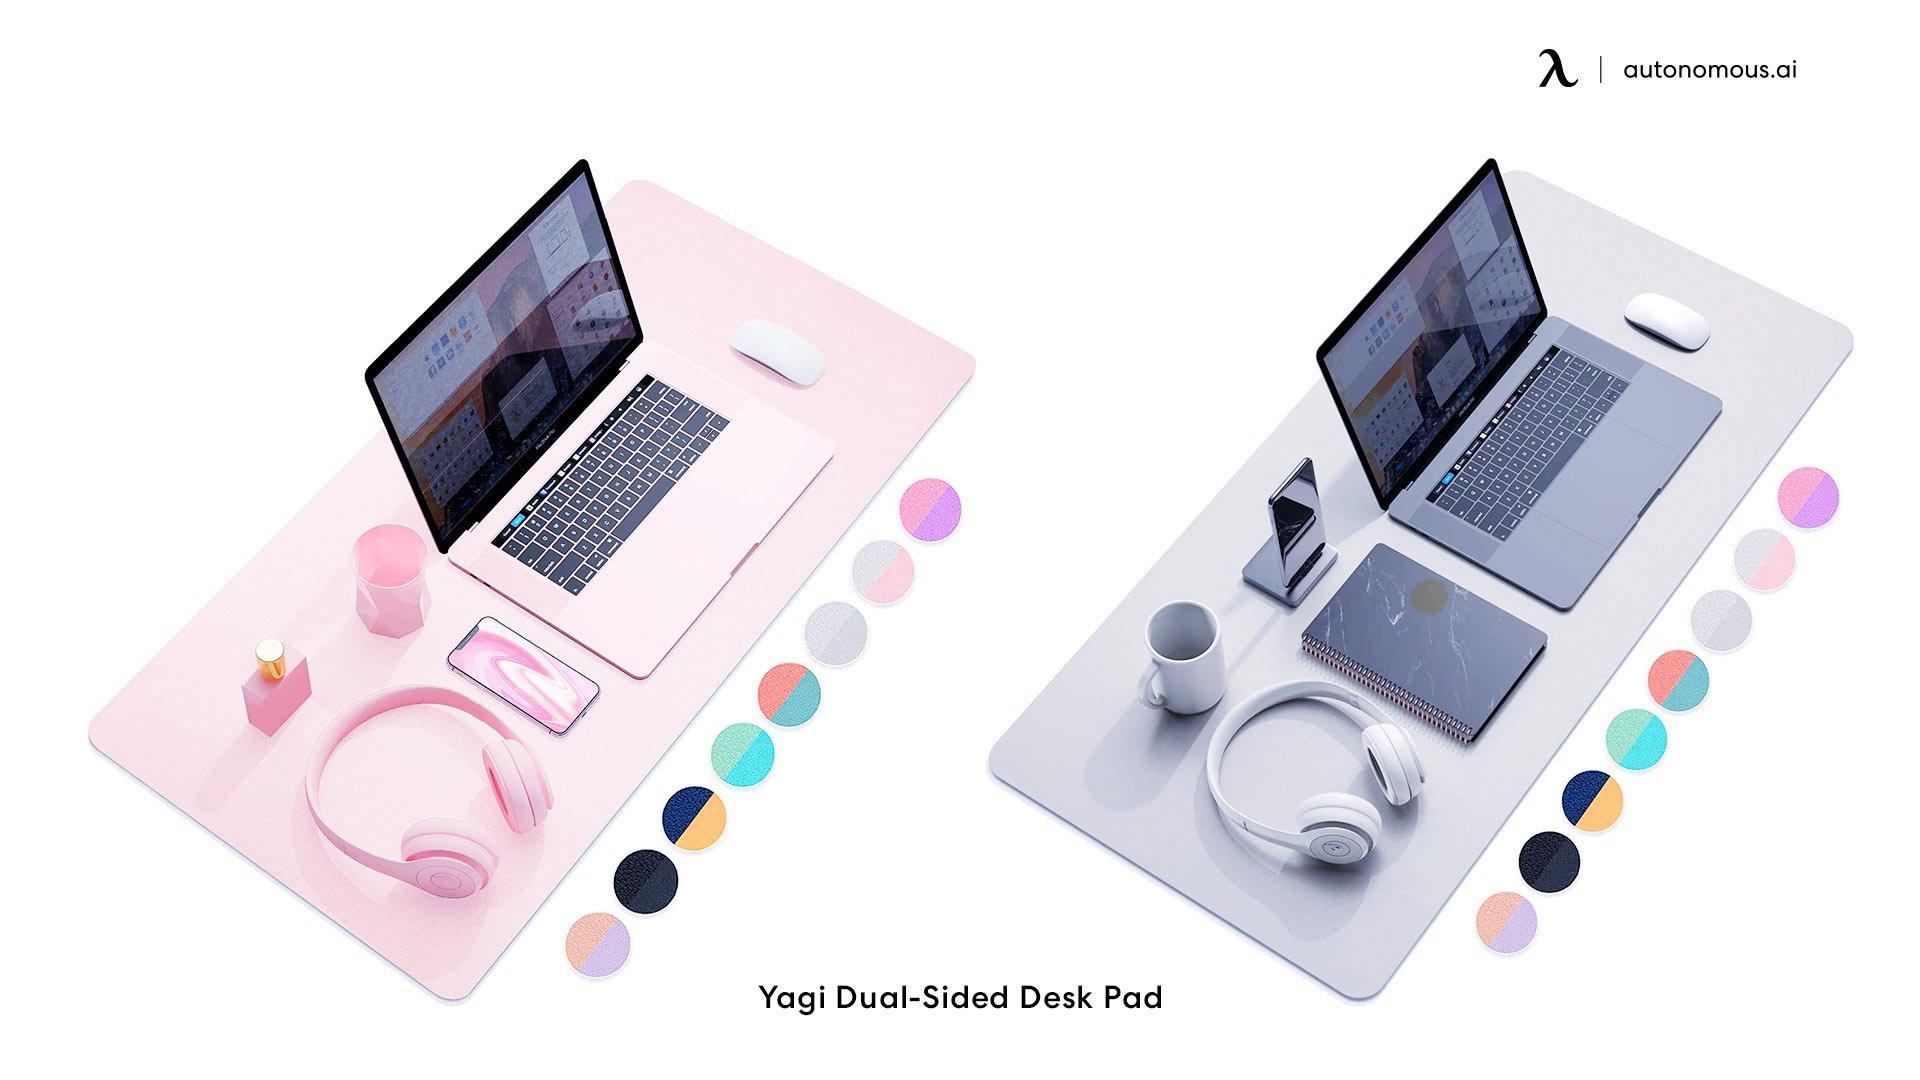 Yagi Dual-Sided Desk Pad